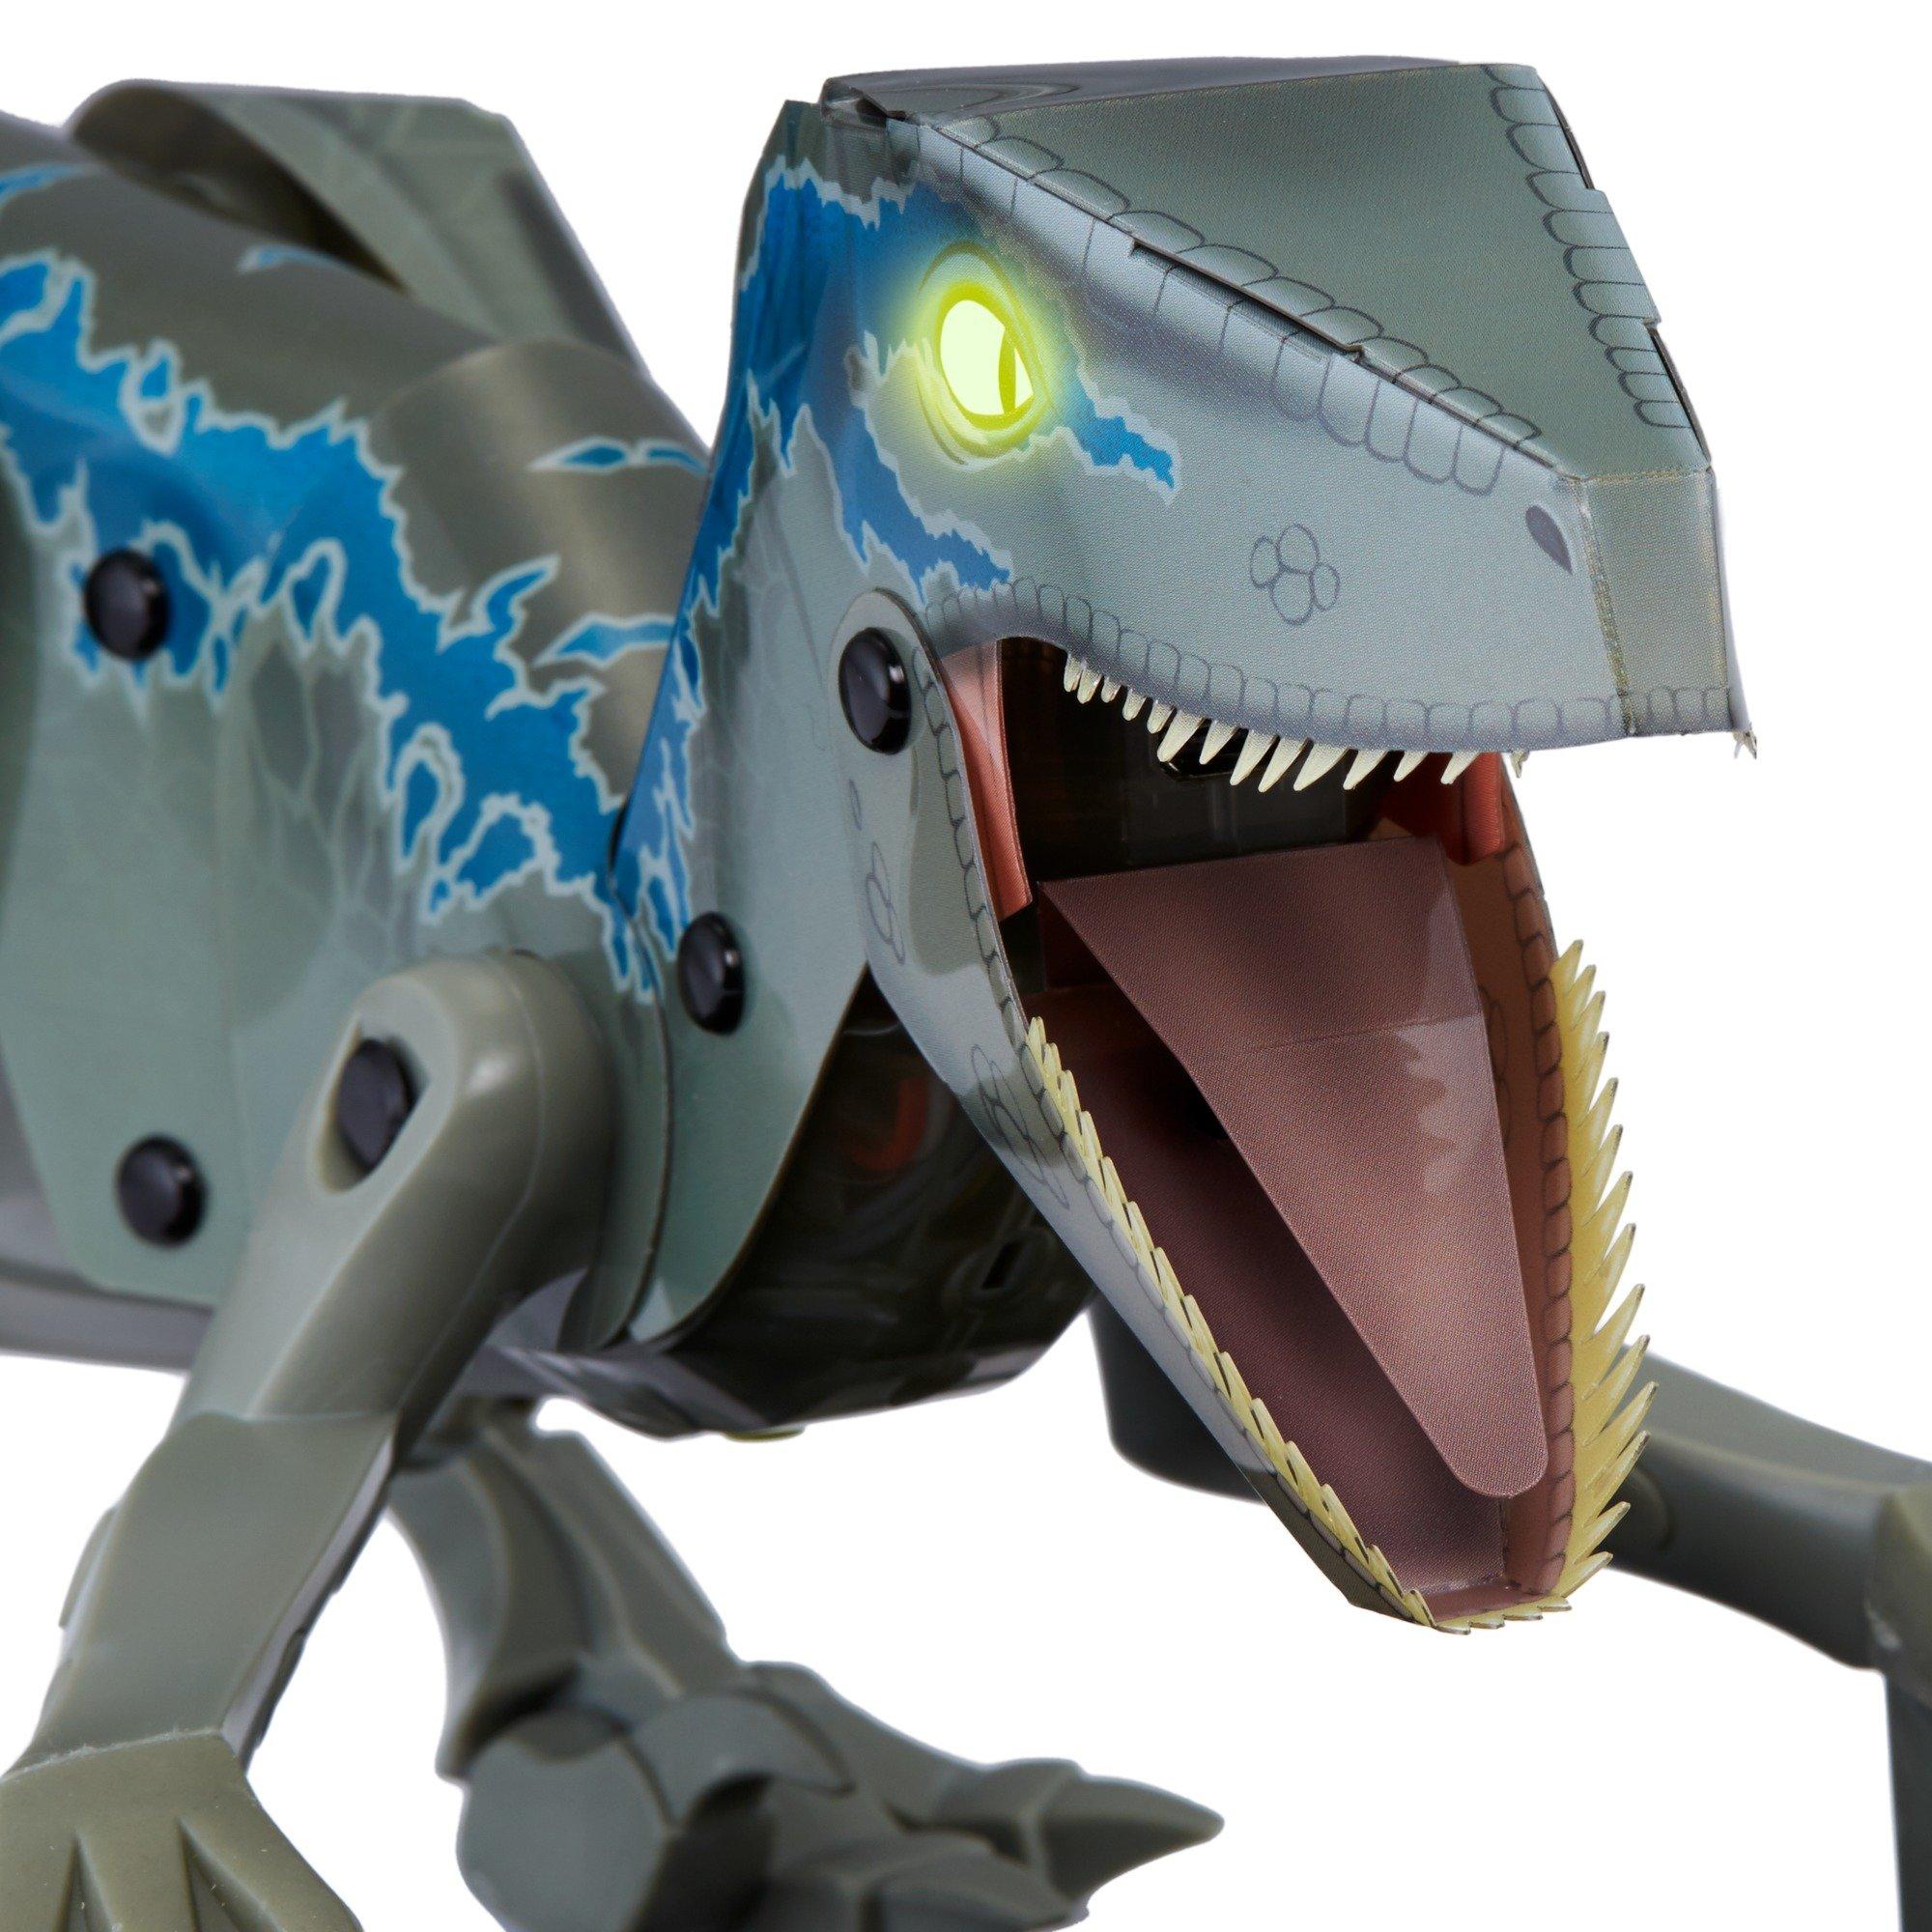 Kamigami Jurassic World Blue Robot by Jurassic World Toys (Image #4)